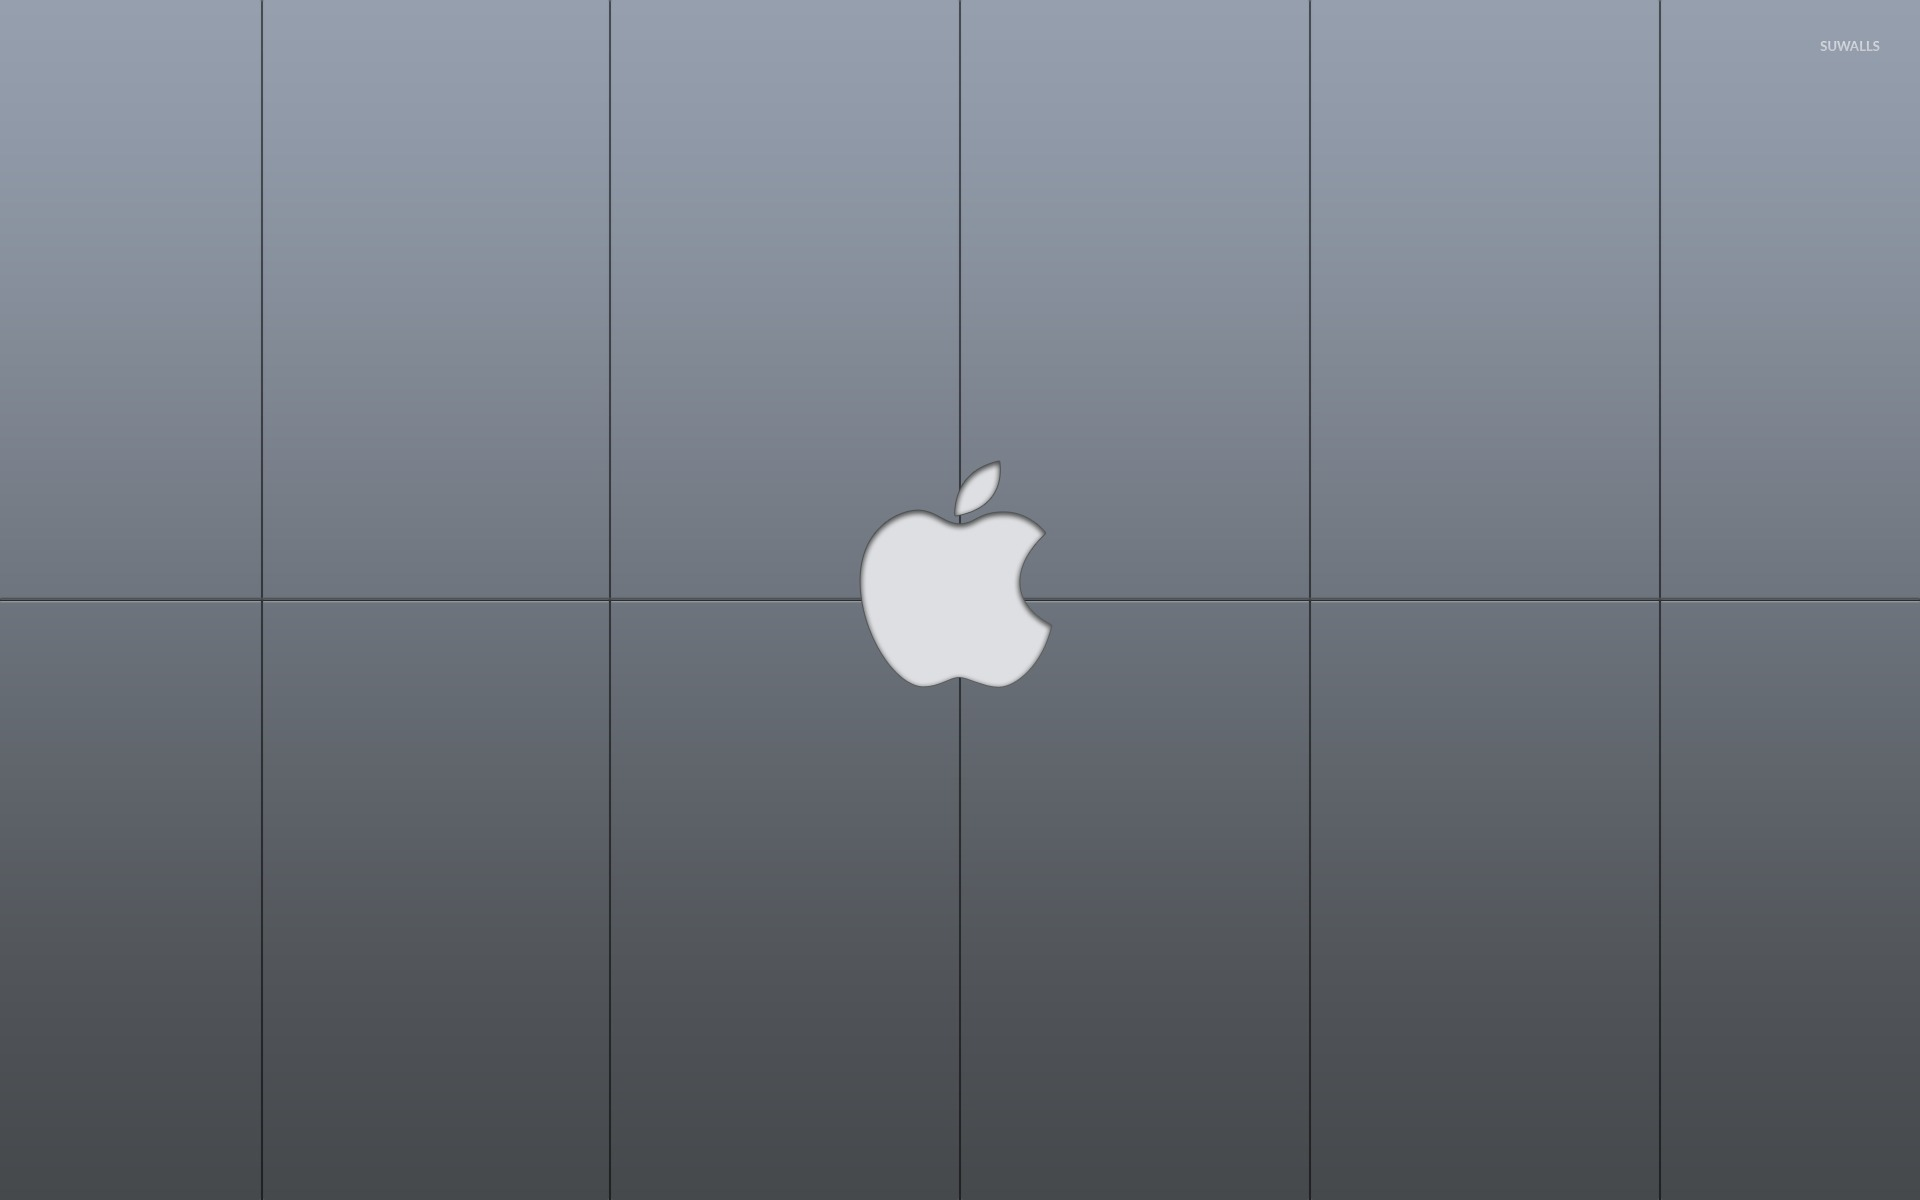 light gray apple logo 53989